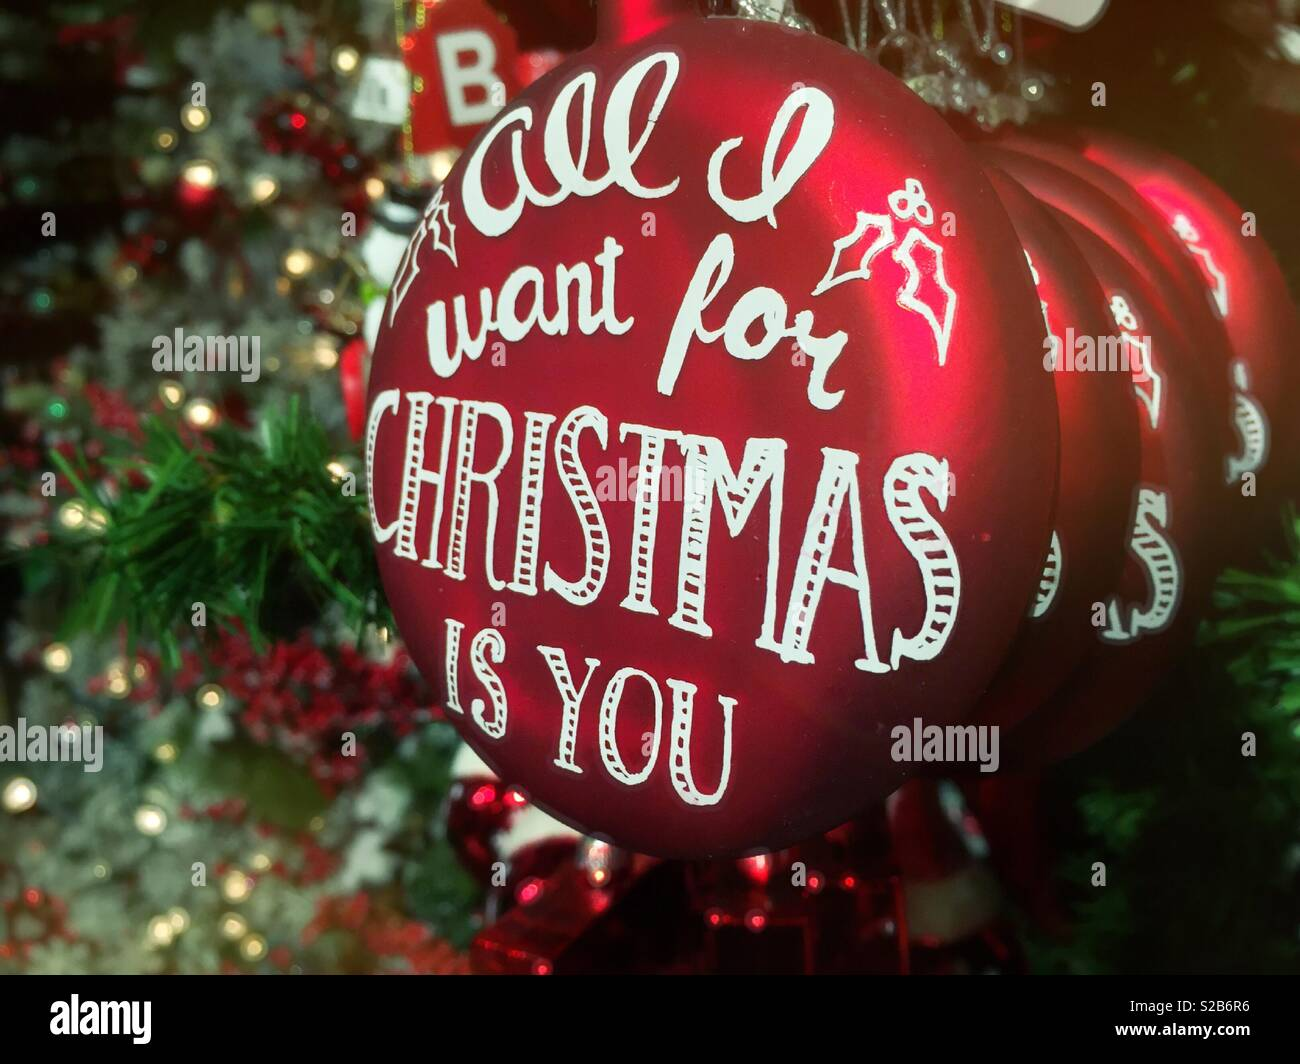 Christmas ornament stating all I want for Christmas is you, USA - Stock Image